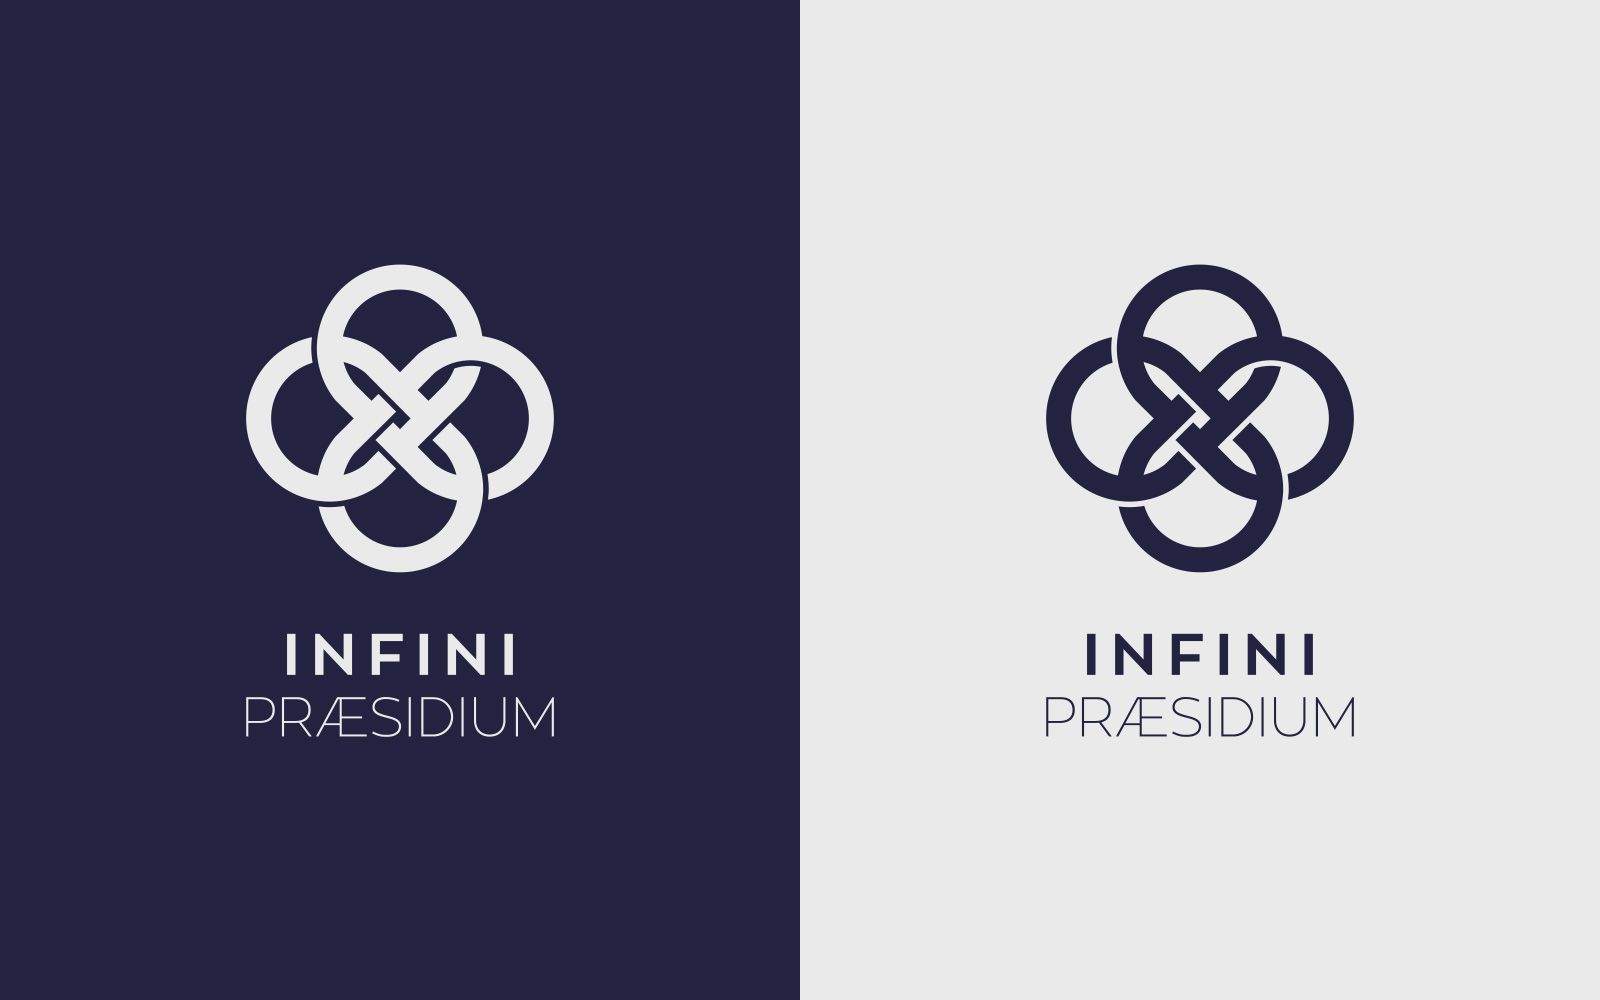 Infini præsidium monochrome